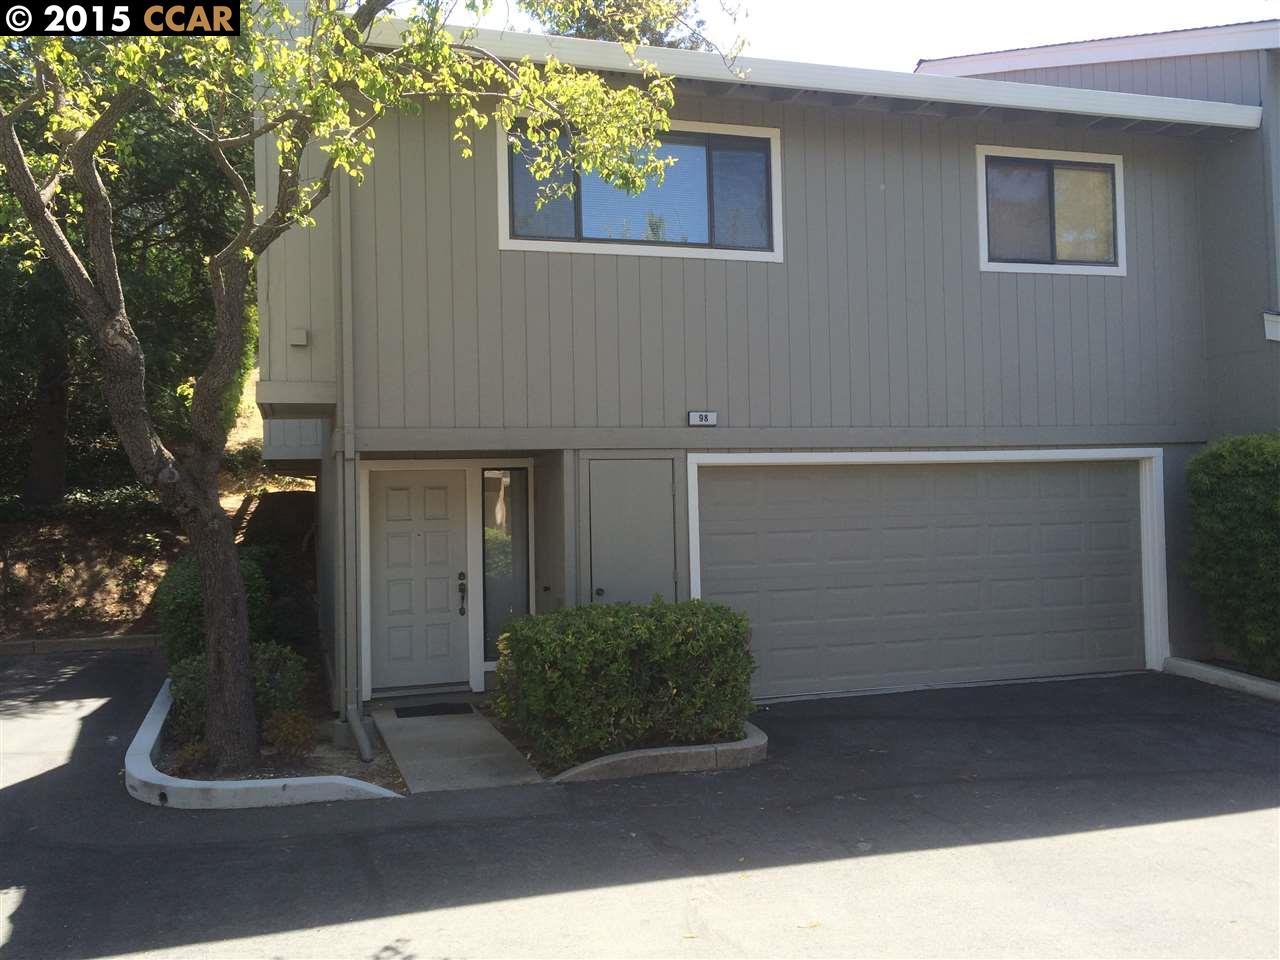 واحد منزل الأسرة للـ Sale في 98 SOUTHWIND Drive Pleasant Hill, California 94523 United States